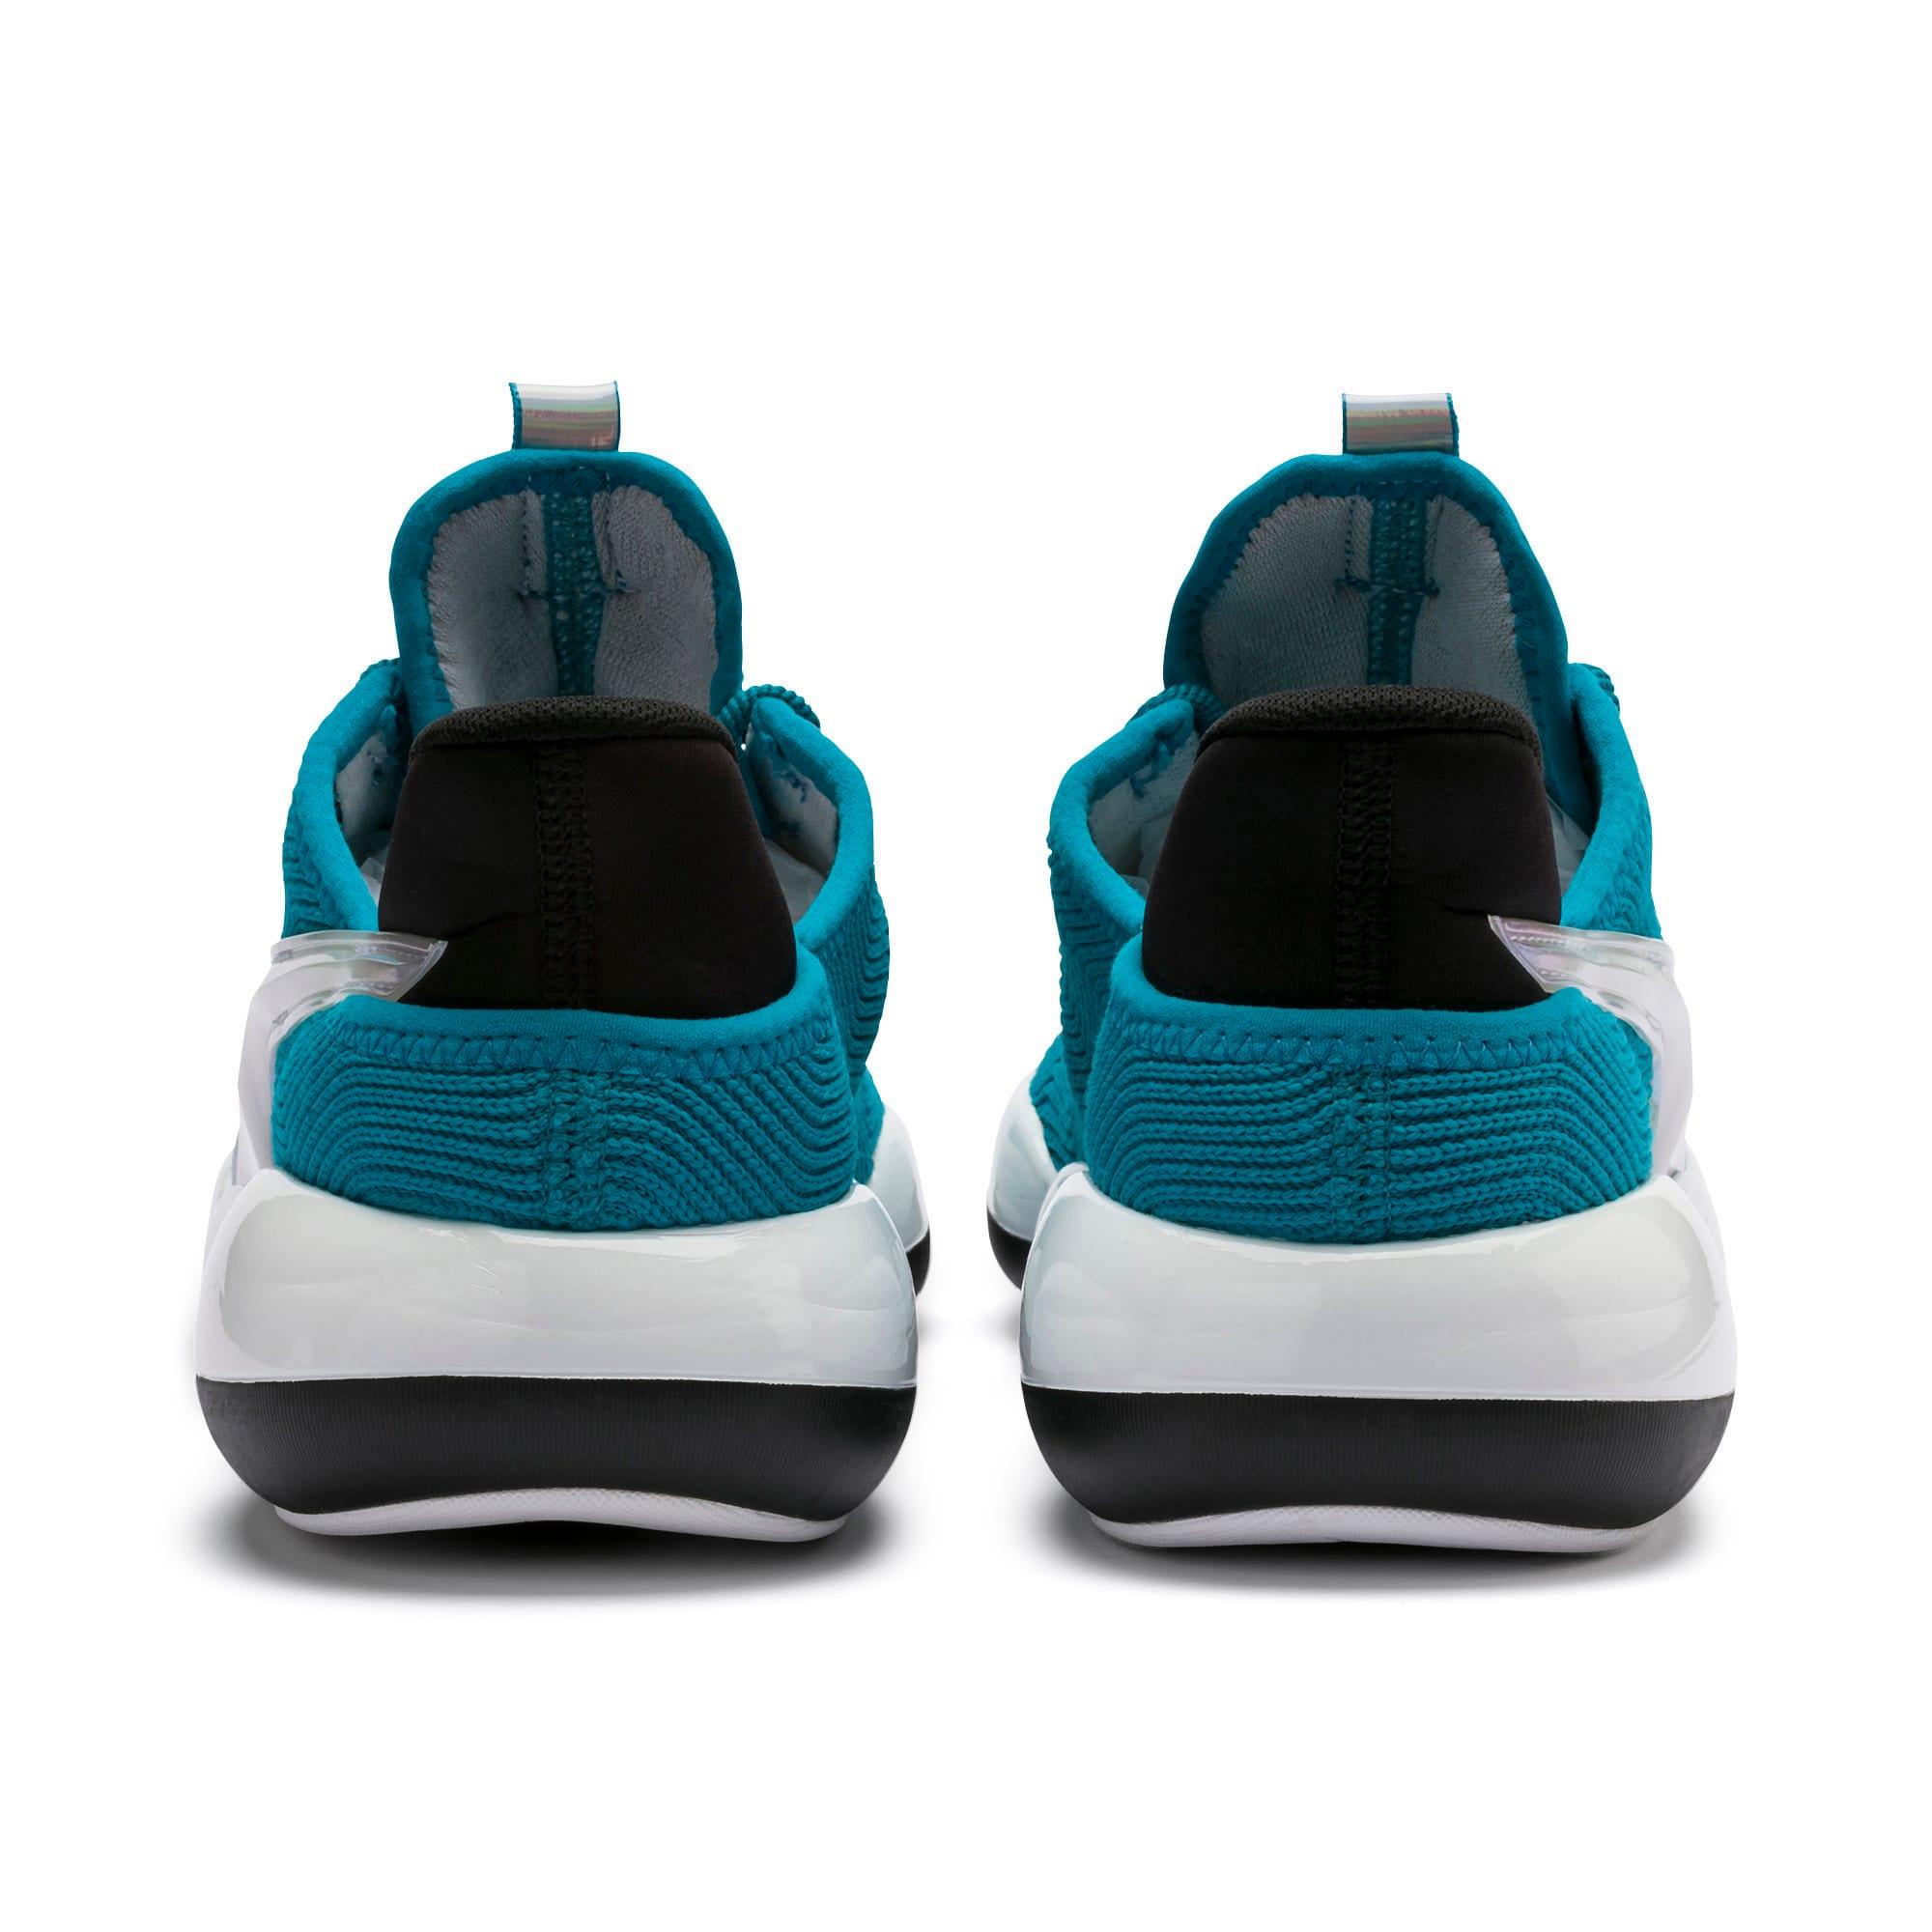 Imagen en miniatura 4 de Zapatillas de mujer Mode XT Iridescent Trailblazer, Caribbean Sea-Puma White, mediana